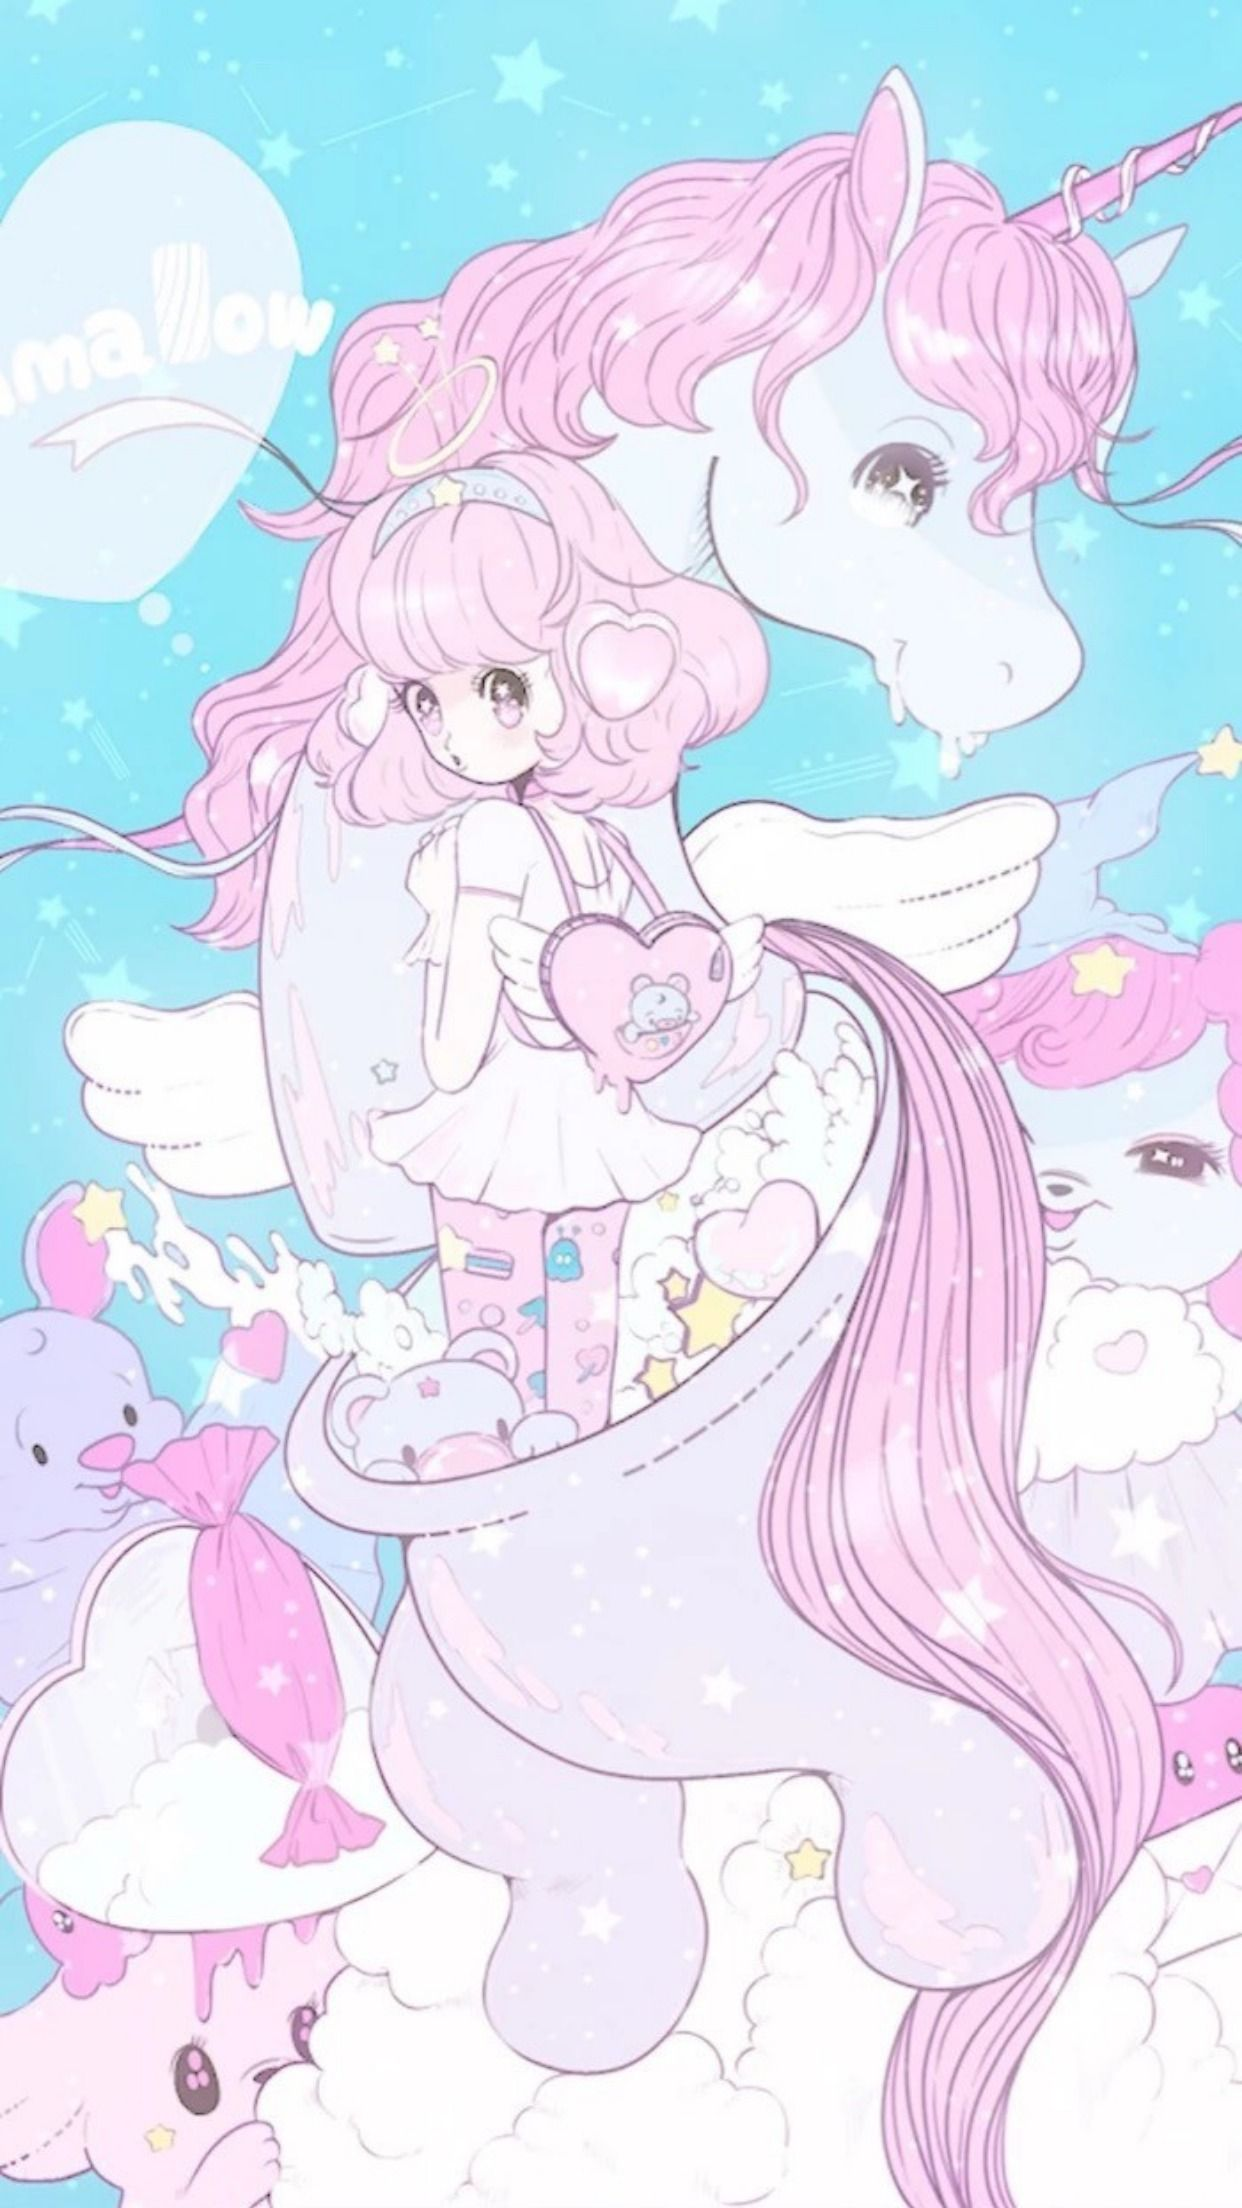 Beautiful Dream Magic Unicorn Wallpaper Unicorn Wallpaper Kawaii Art Kawaii Wallpaper